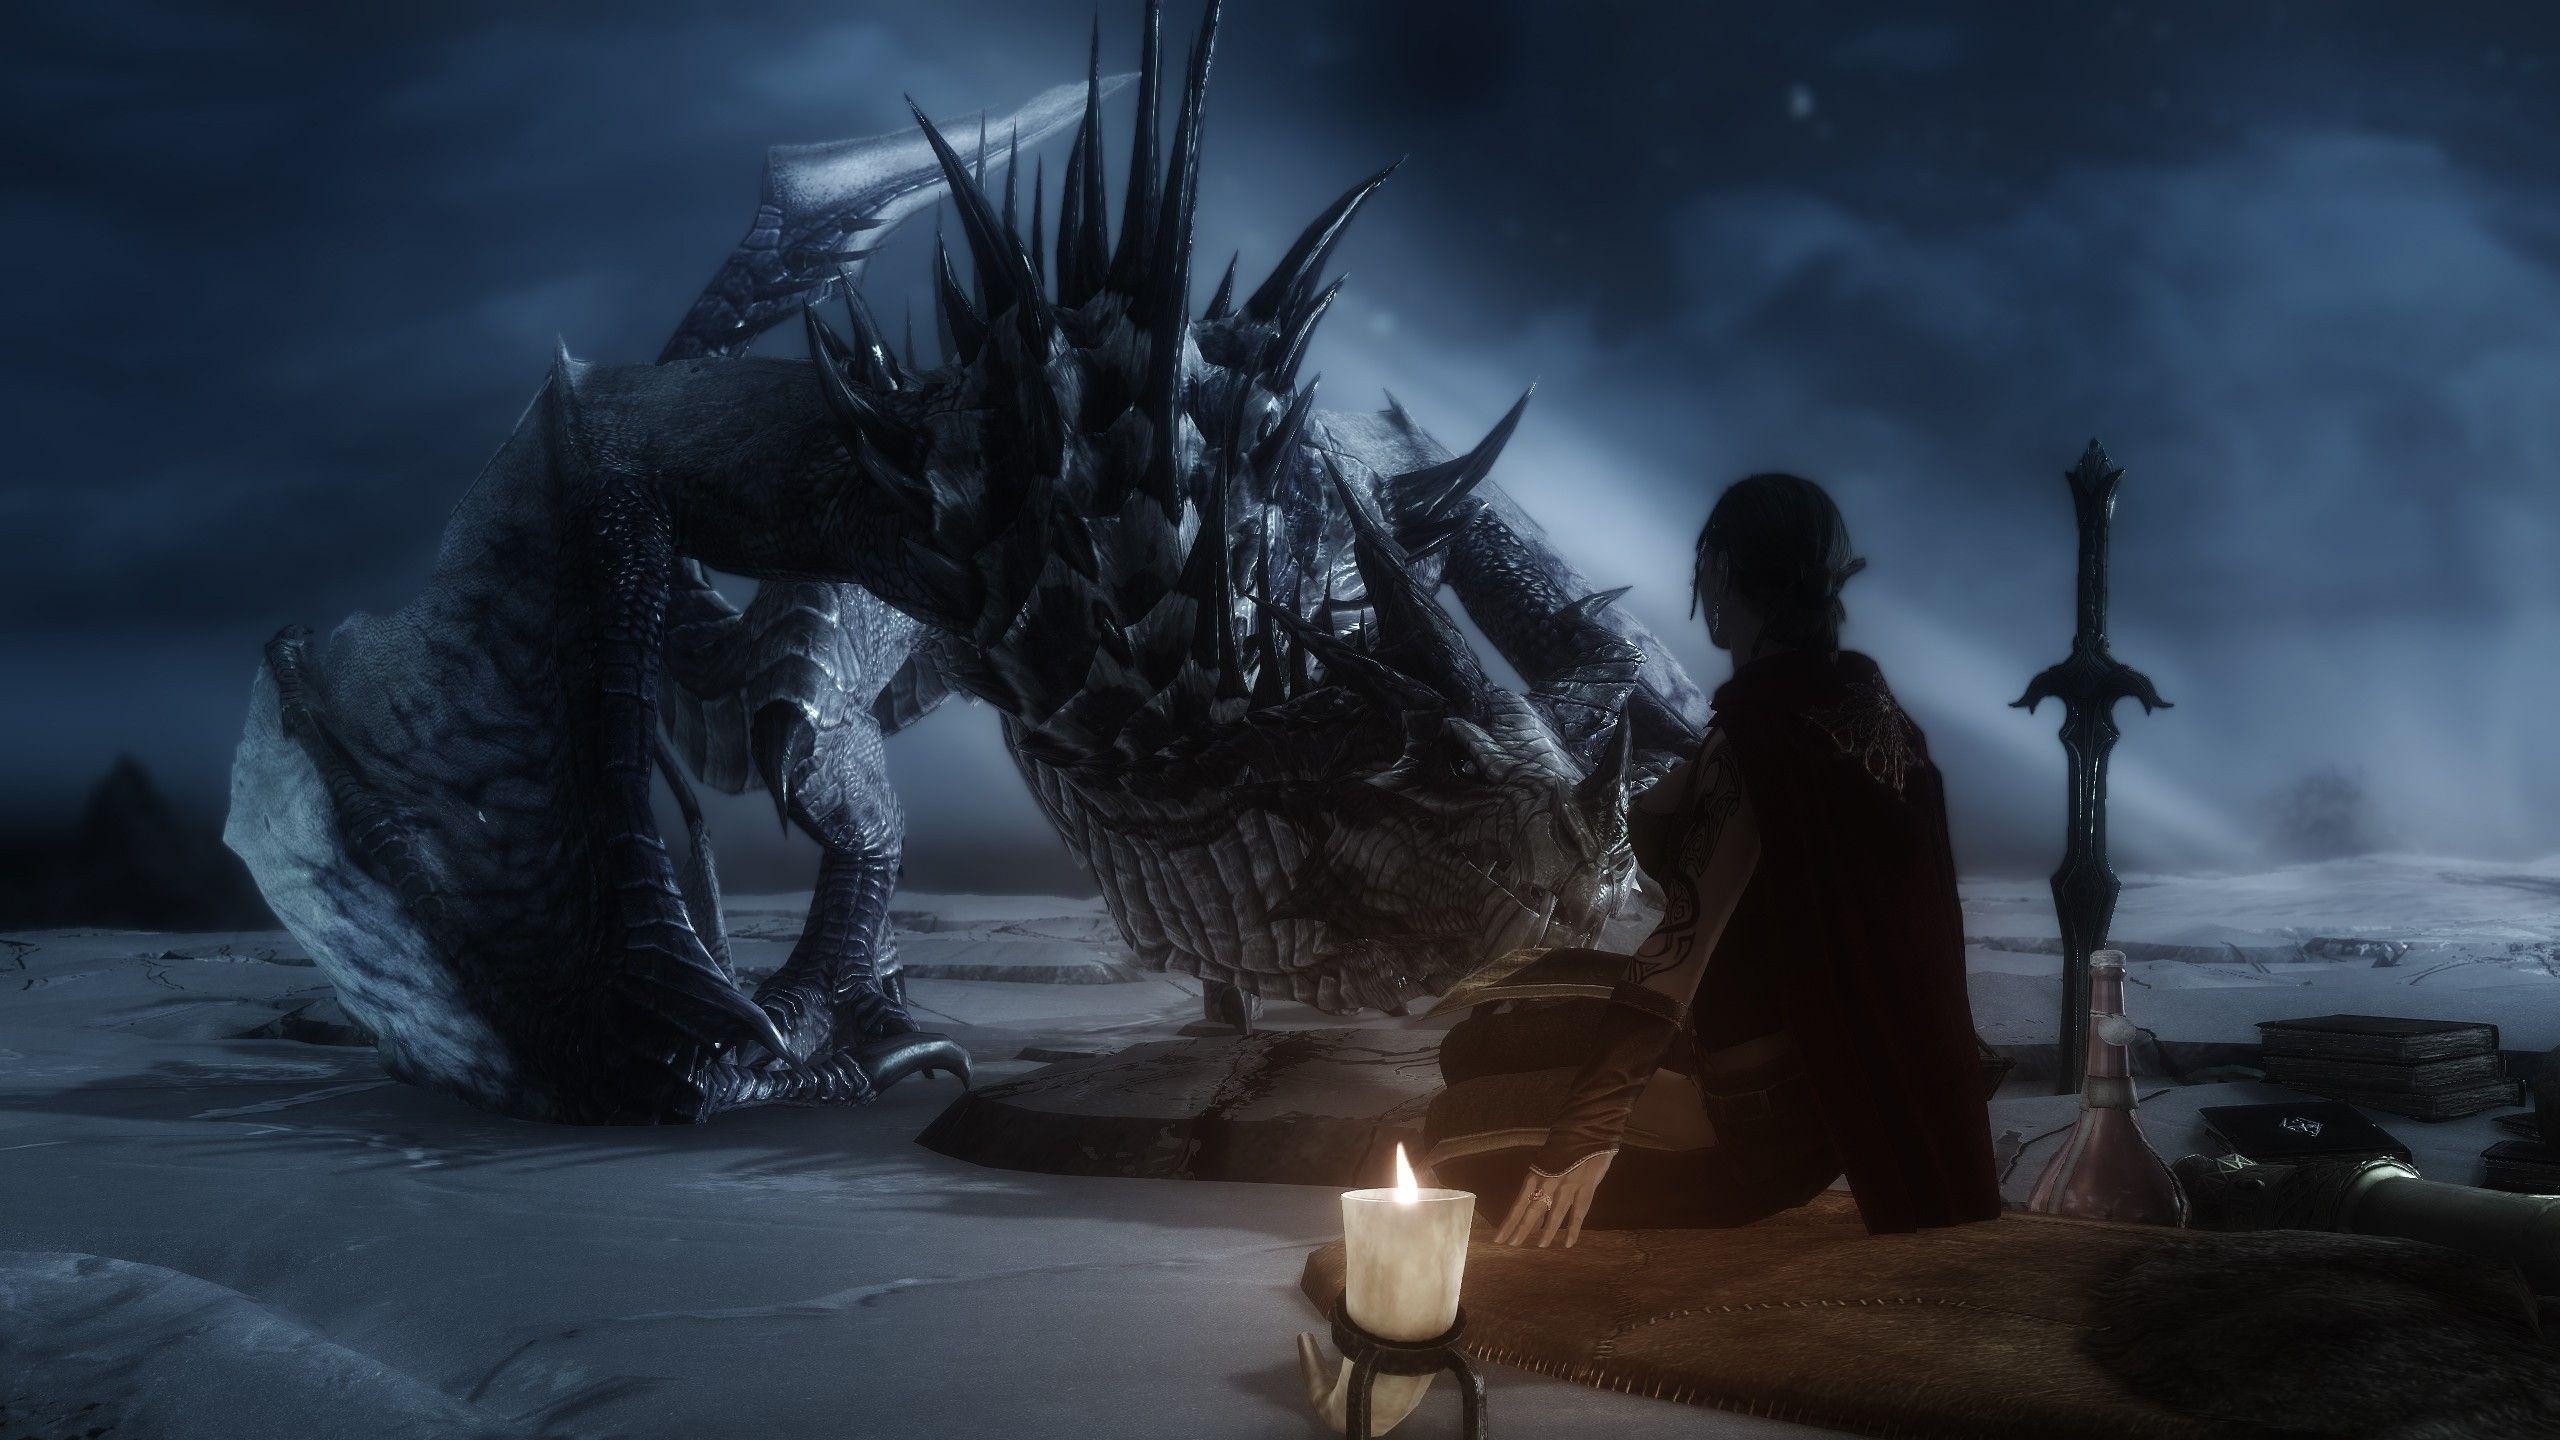 The Elder Scrolls V Skyrim Dragon Wallpapers Hd Desktop And